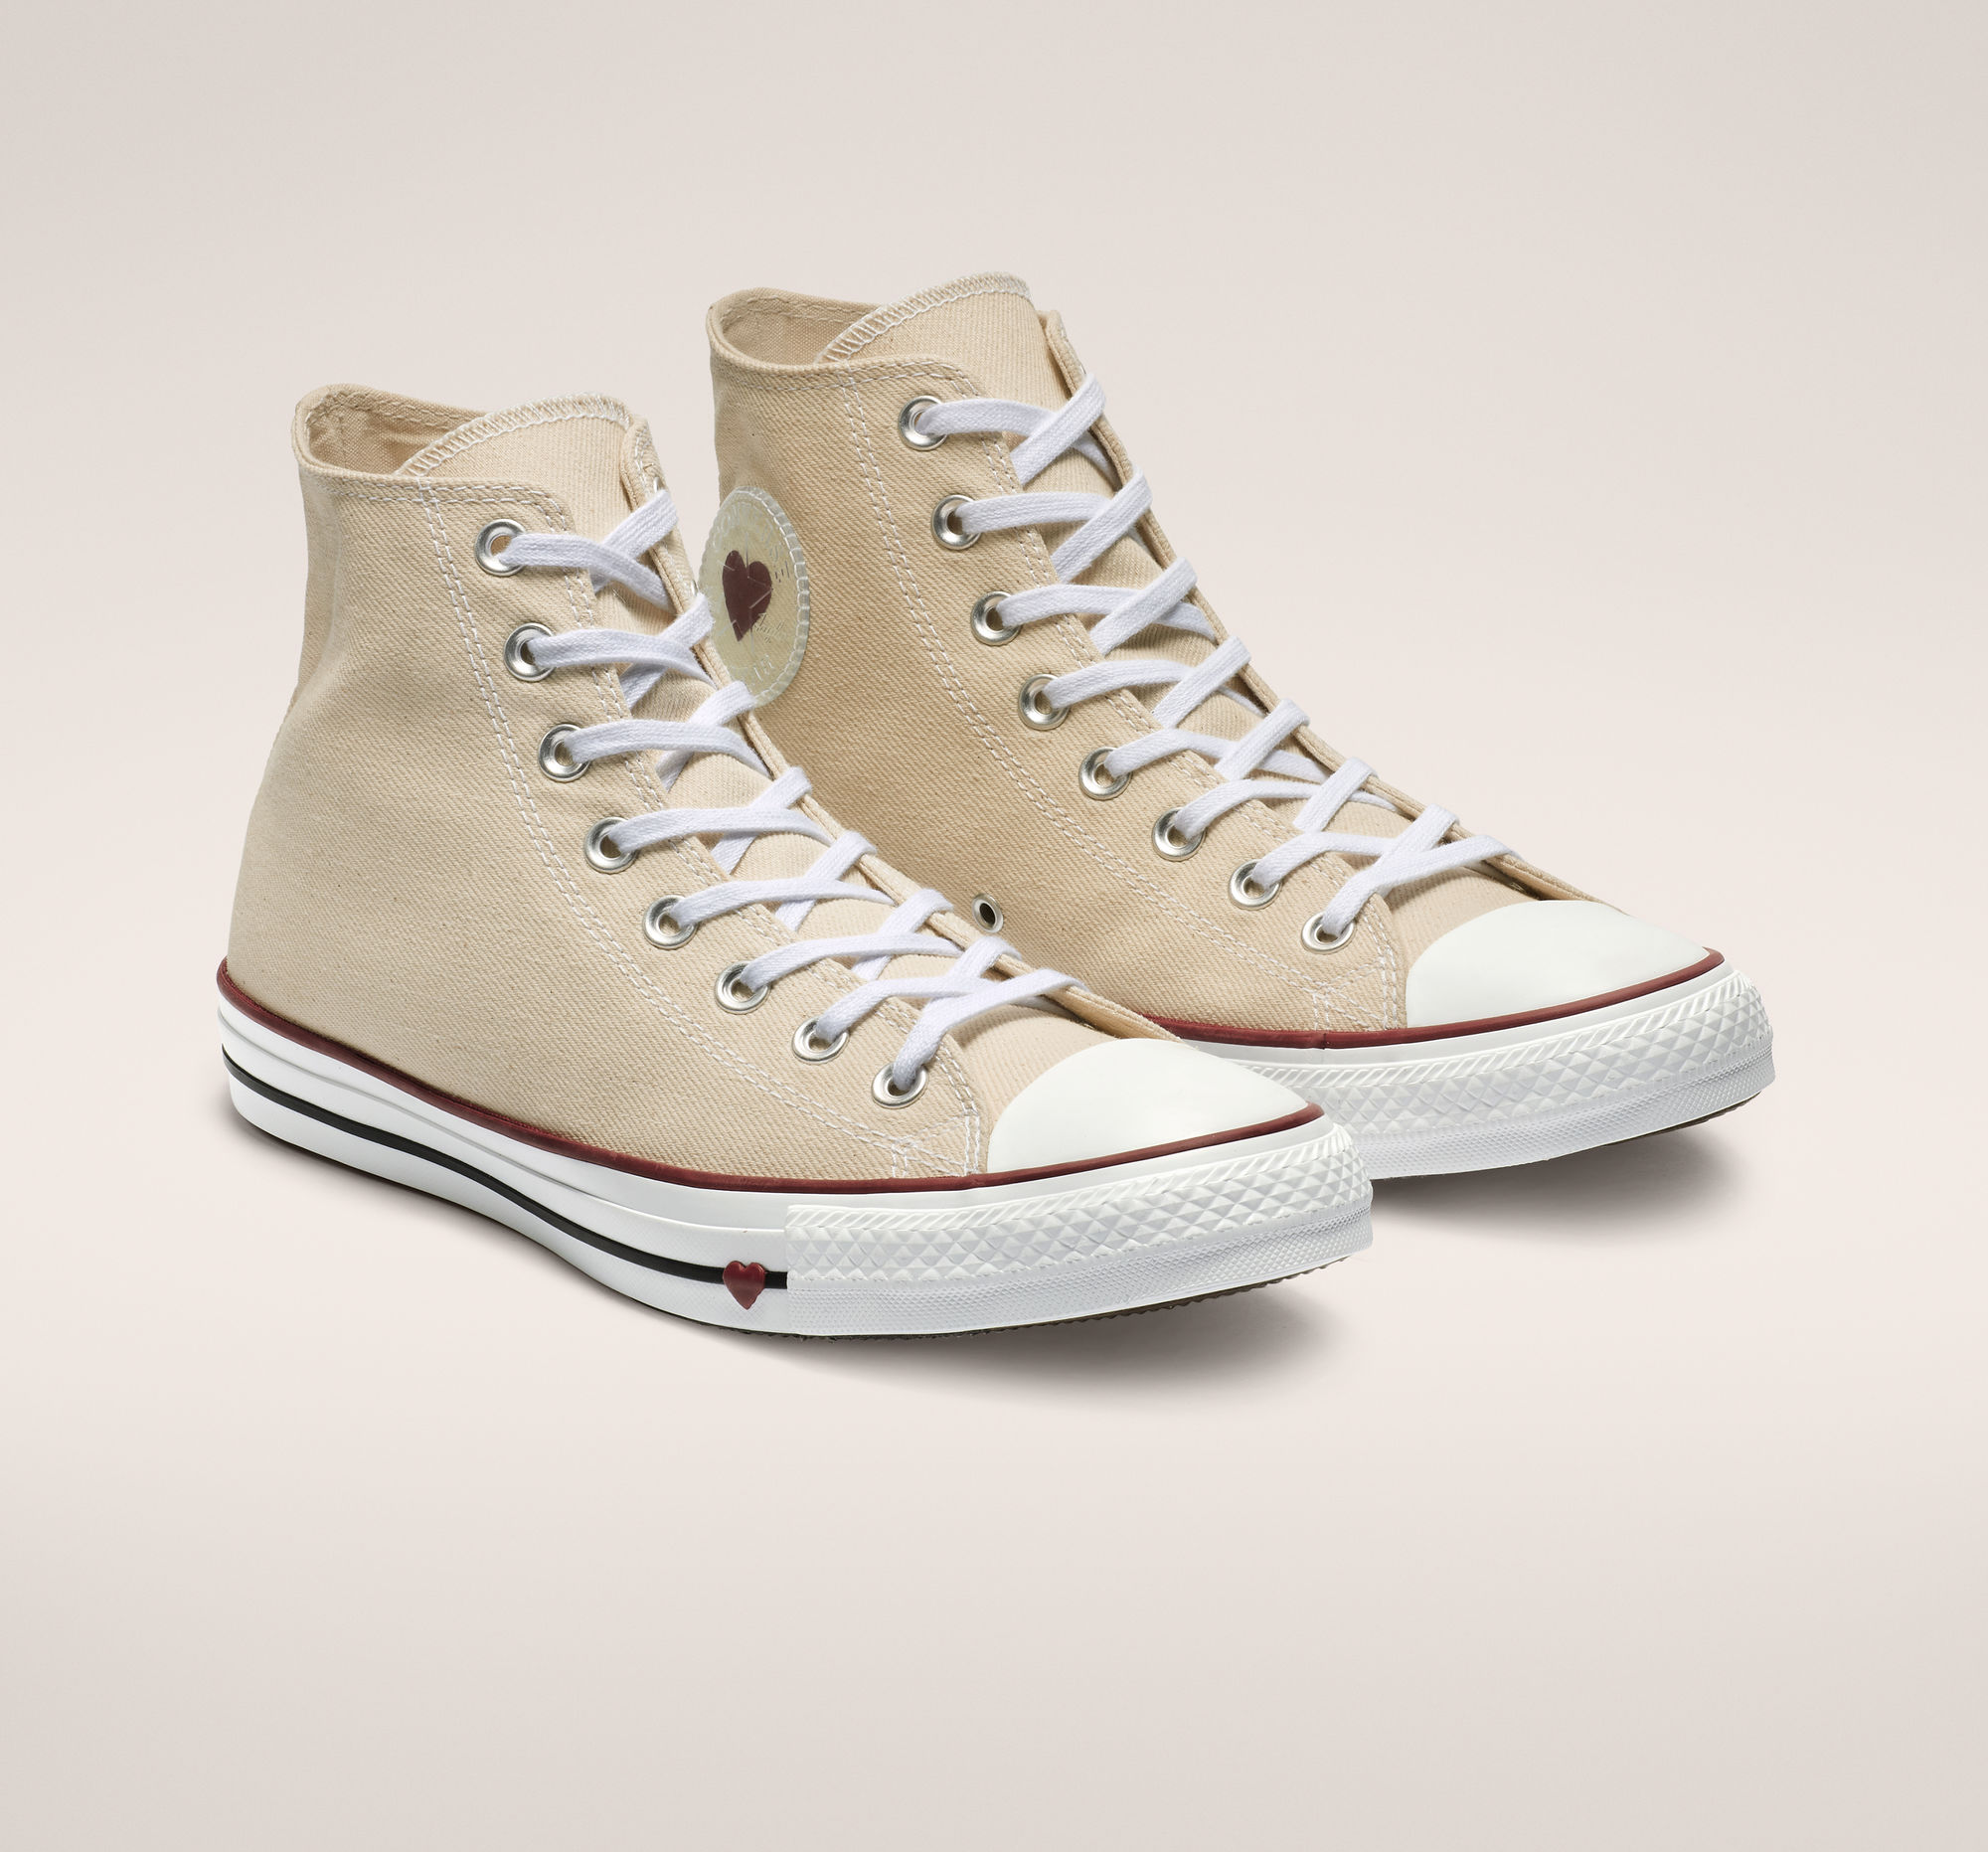 Chuck Taylor All Star Denim Love High Top in Natural White/Garnet